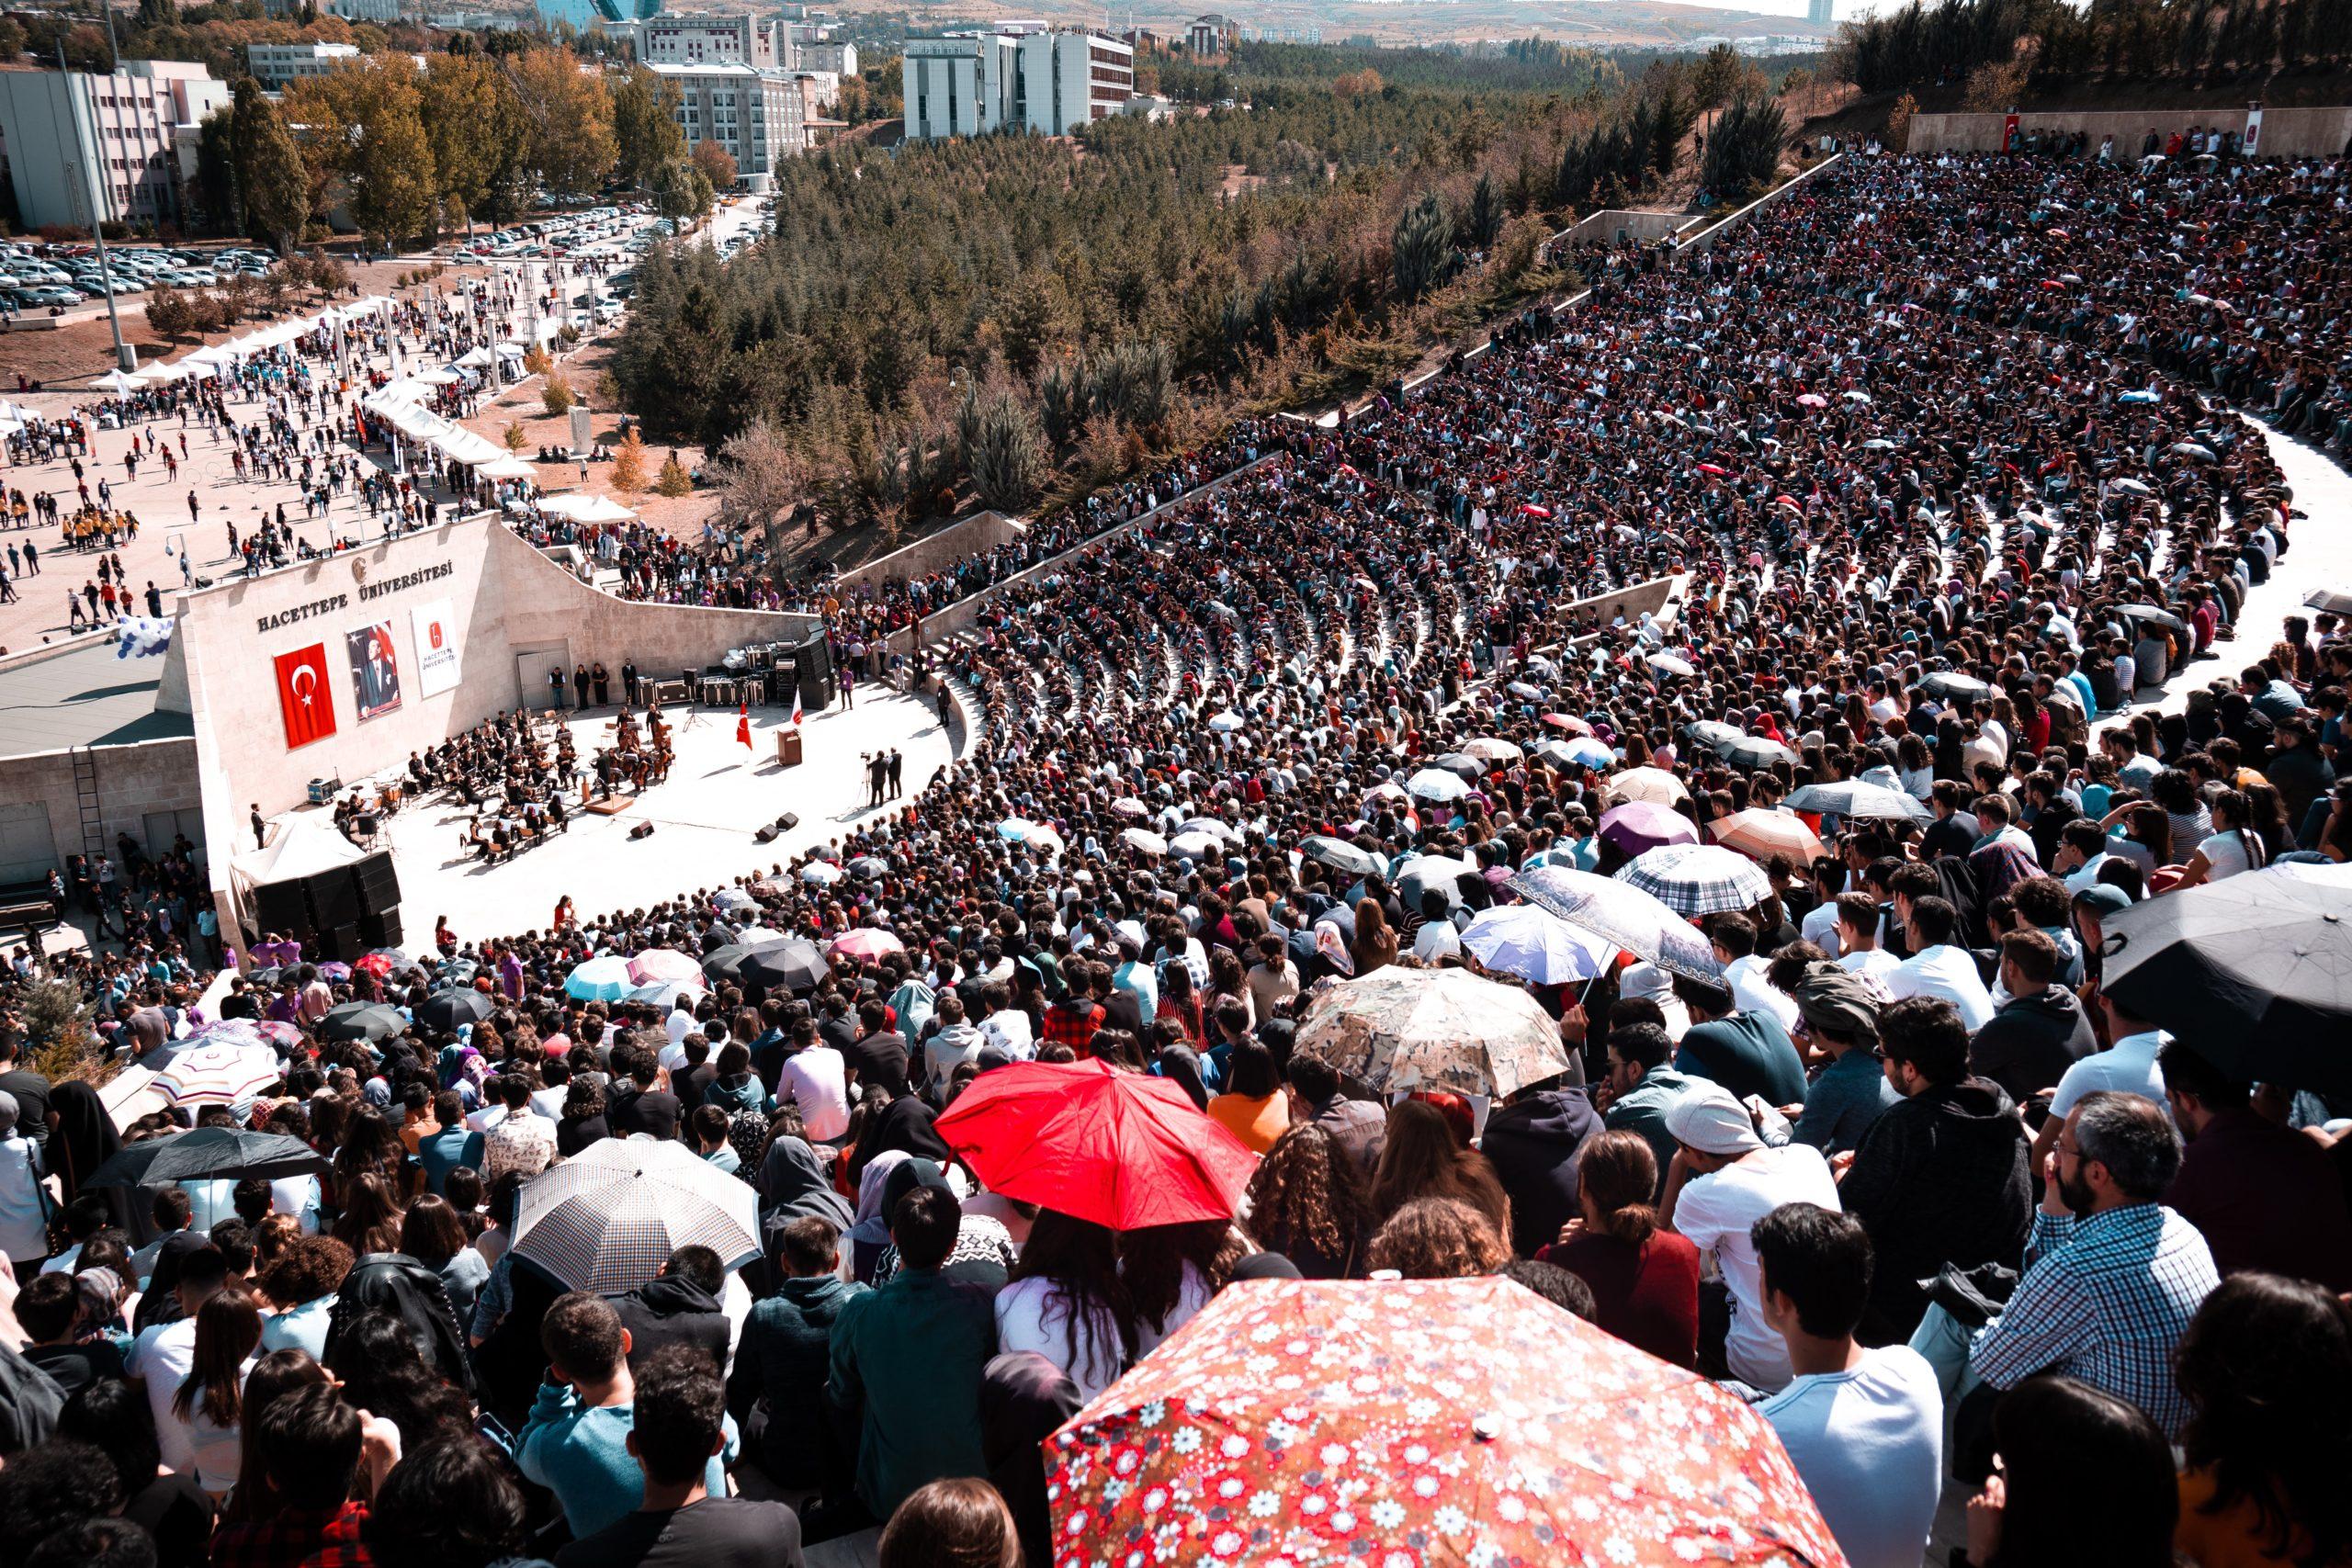 Amphitheater in Ankara by Deniz Gocmen